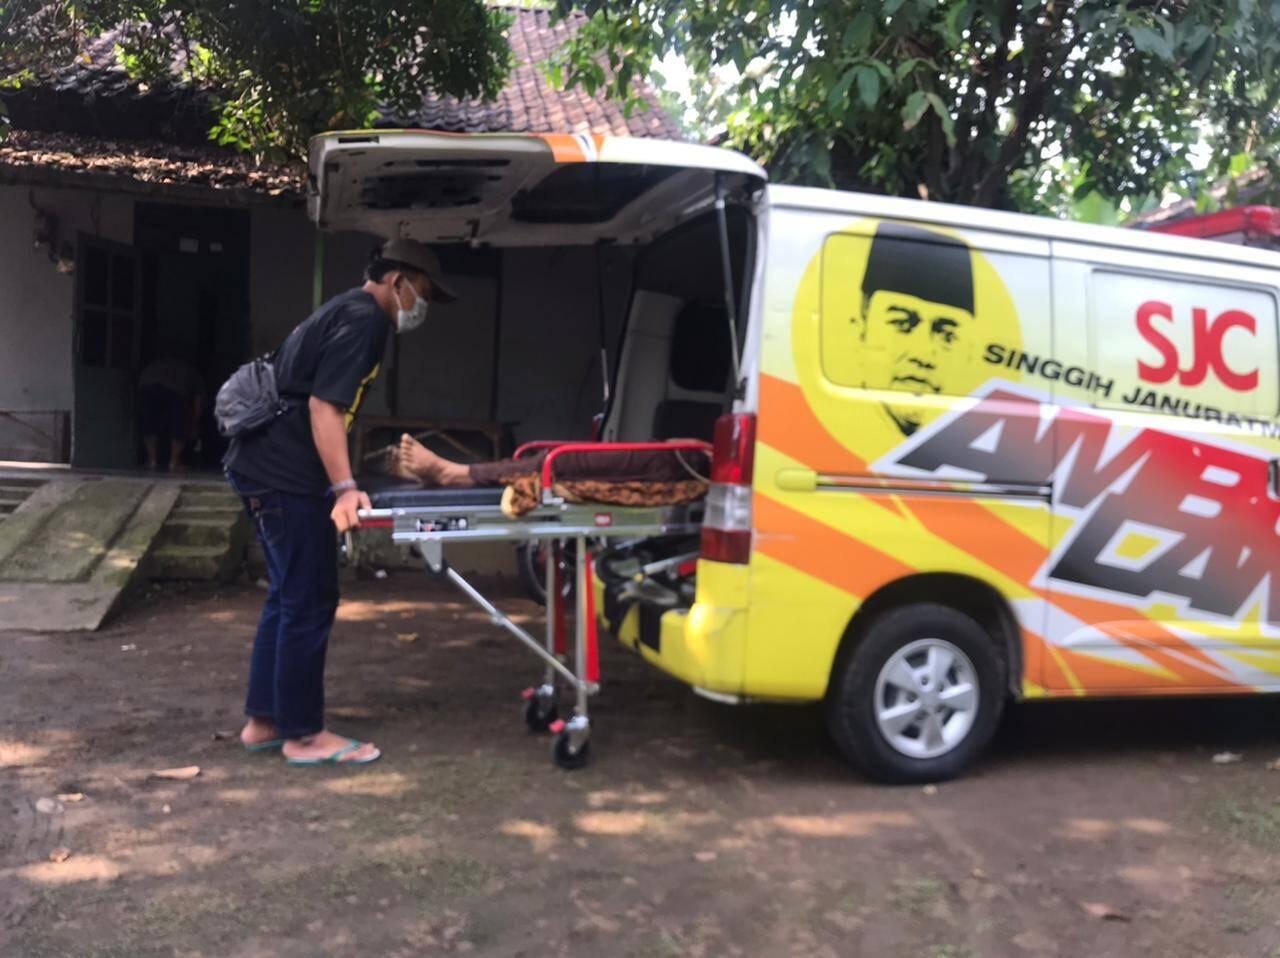 Ambulans SJC